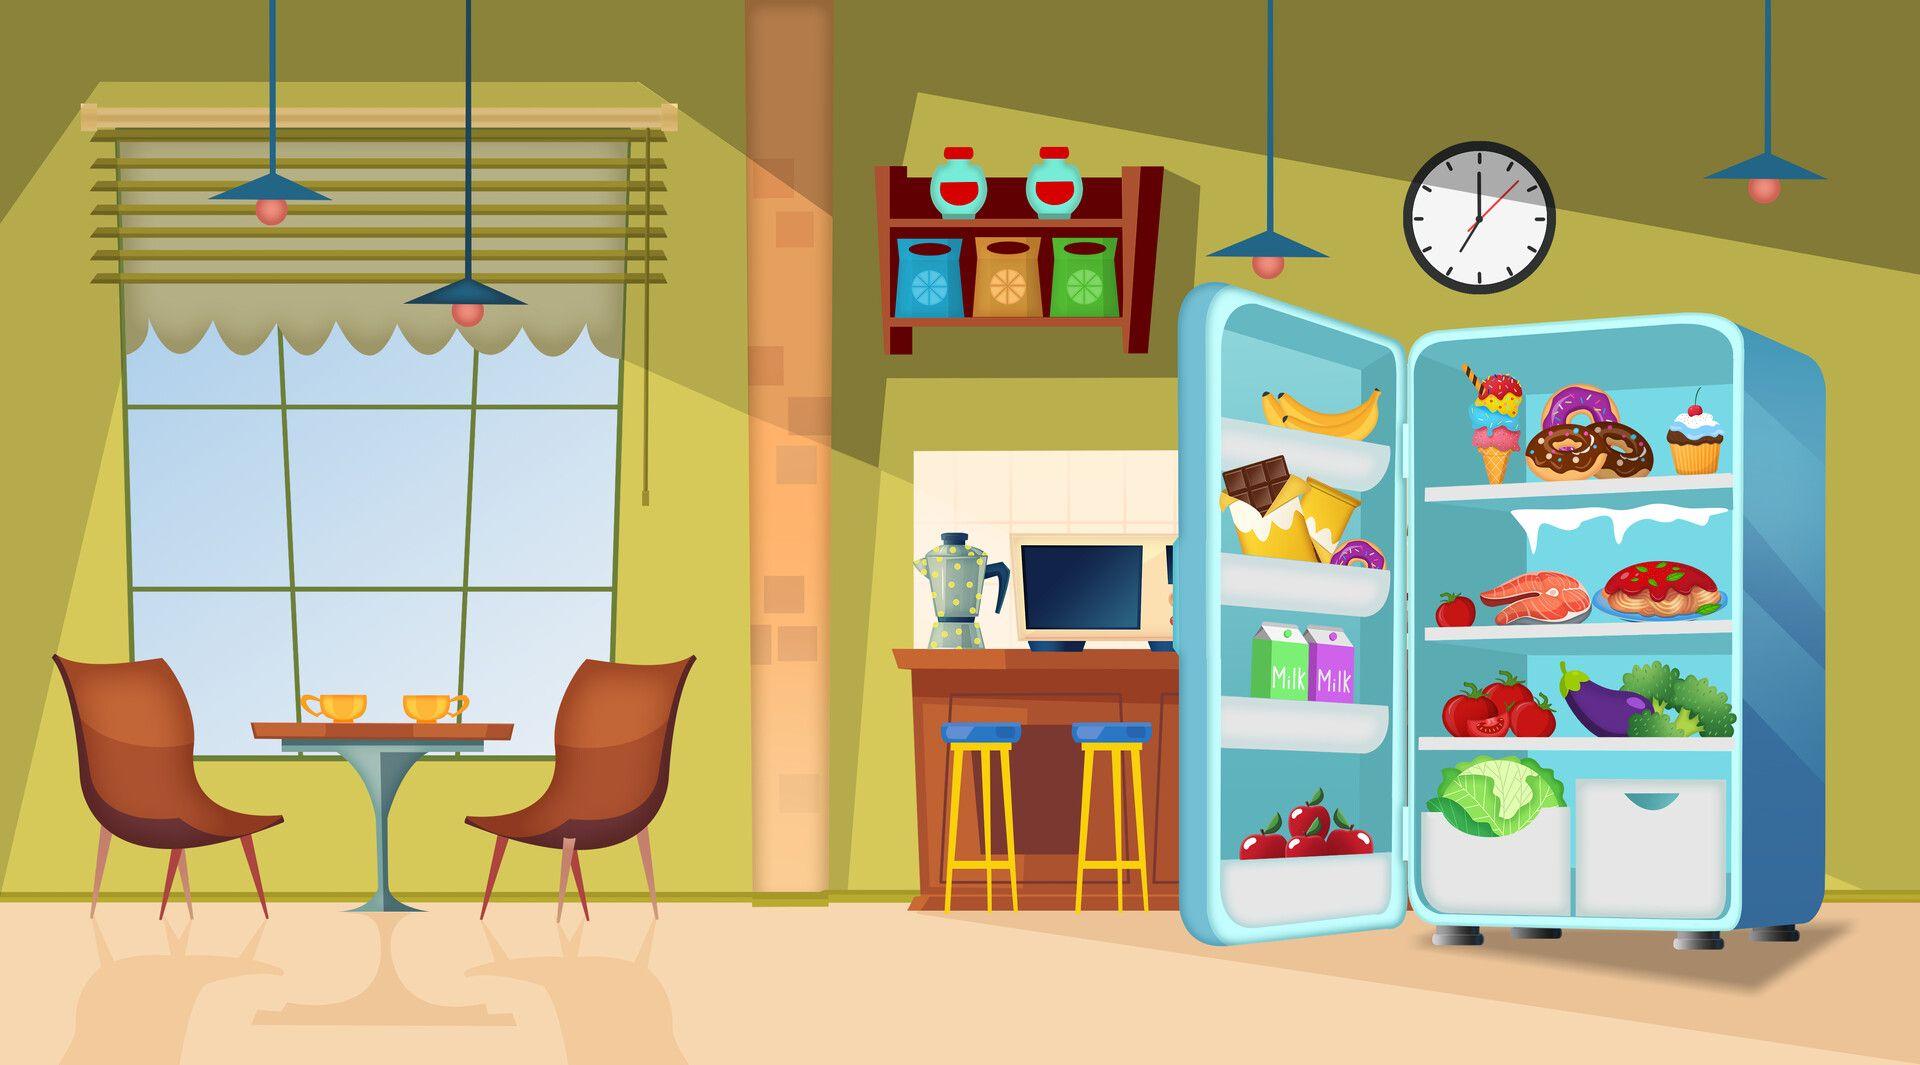 Kitchen Scene Kittyphone Cartoon And Song By Bozhena